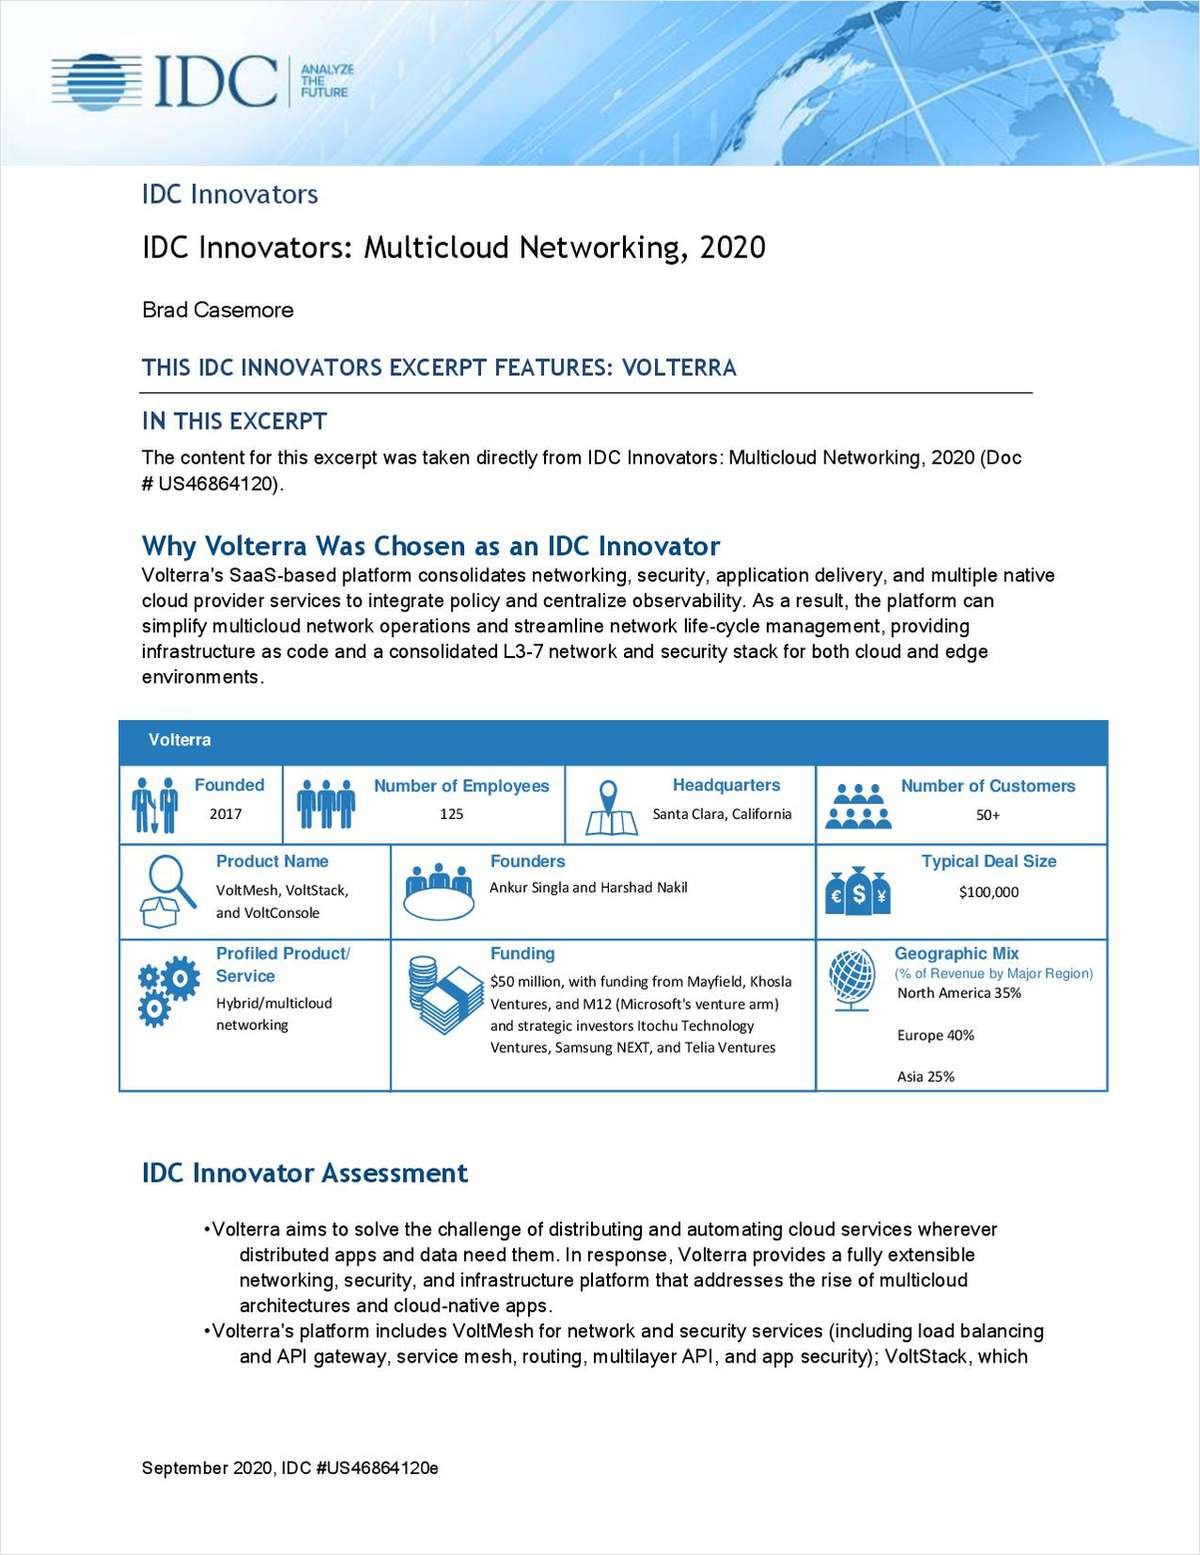 IDC Innovators: Multicloud Networking, 2020